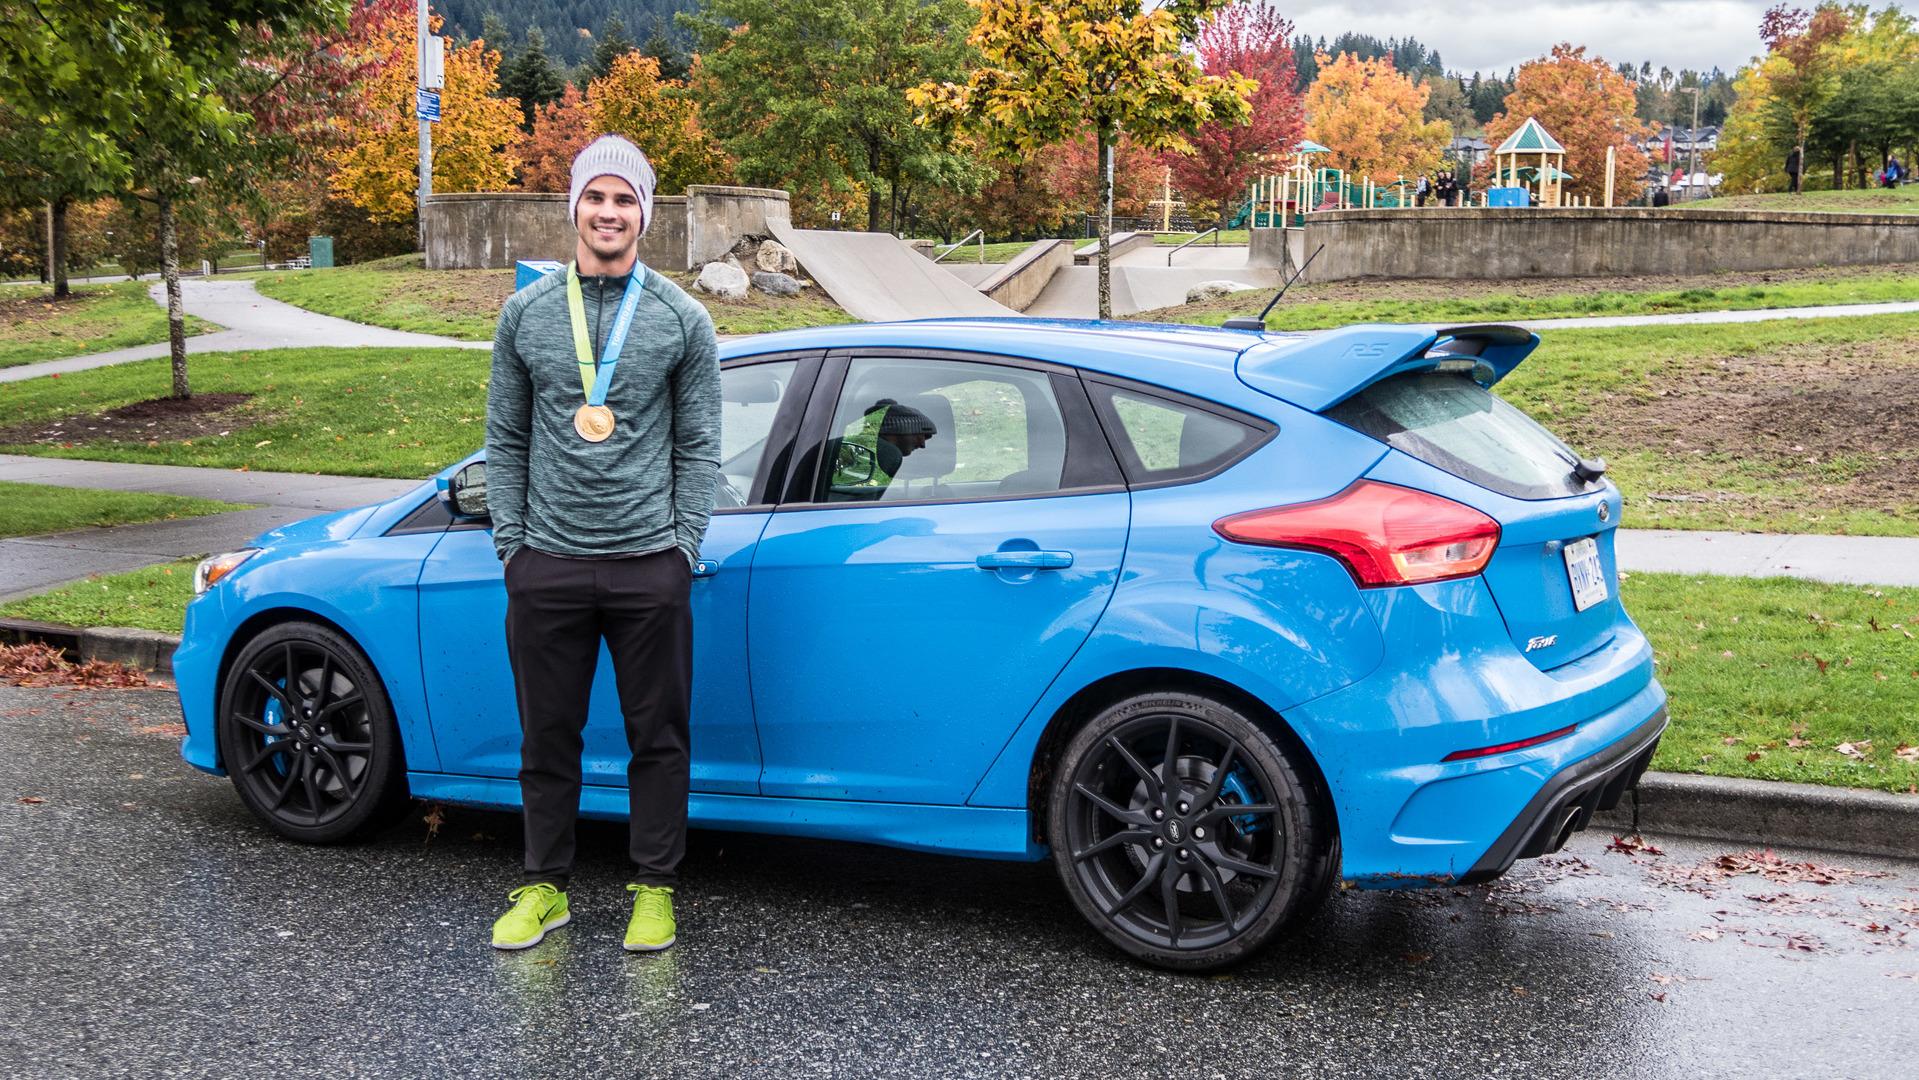 Vancouver Car Meets